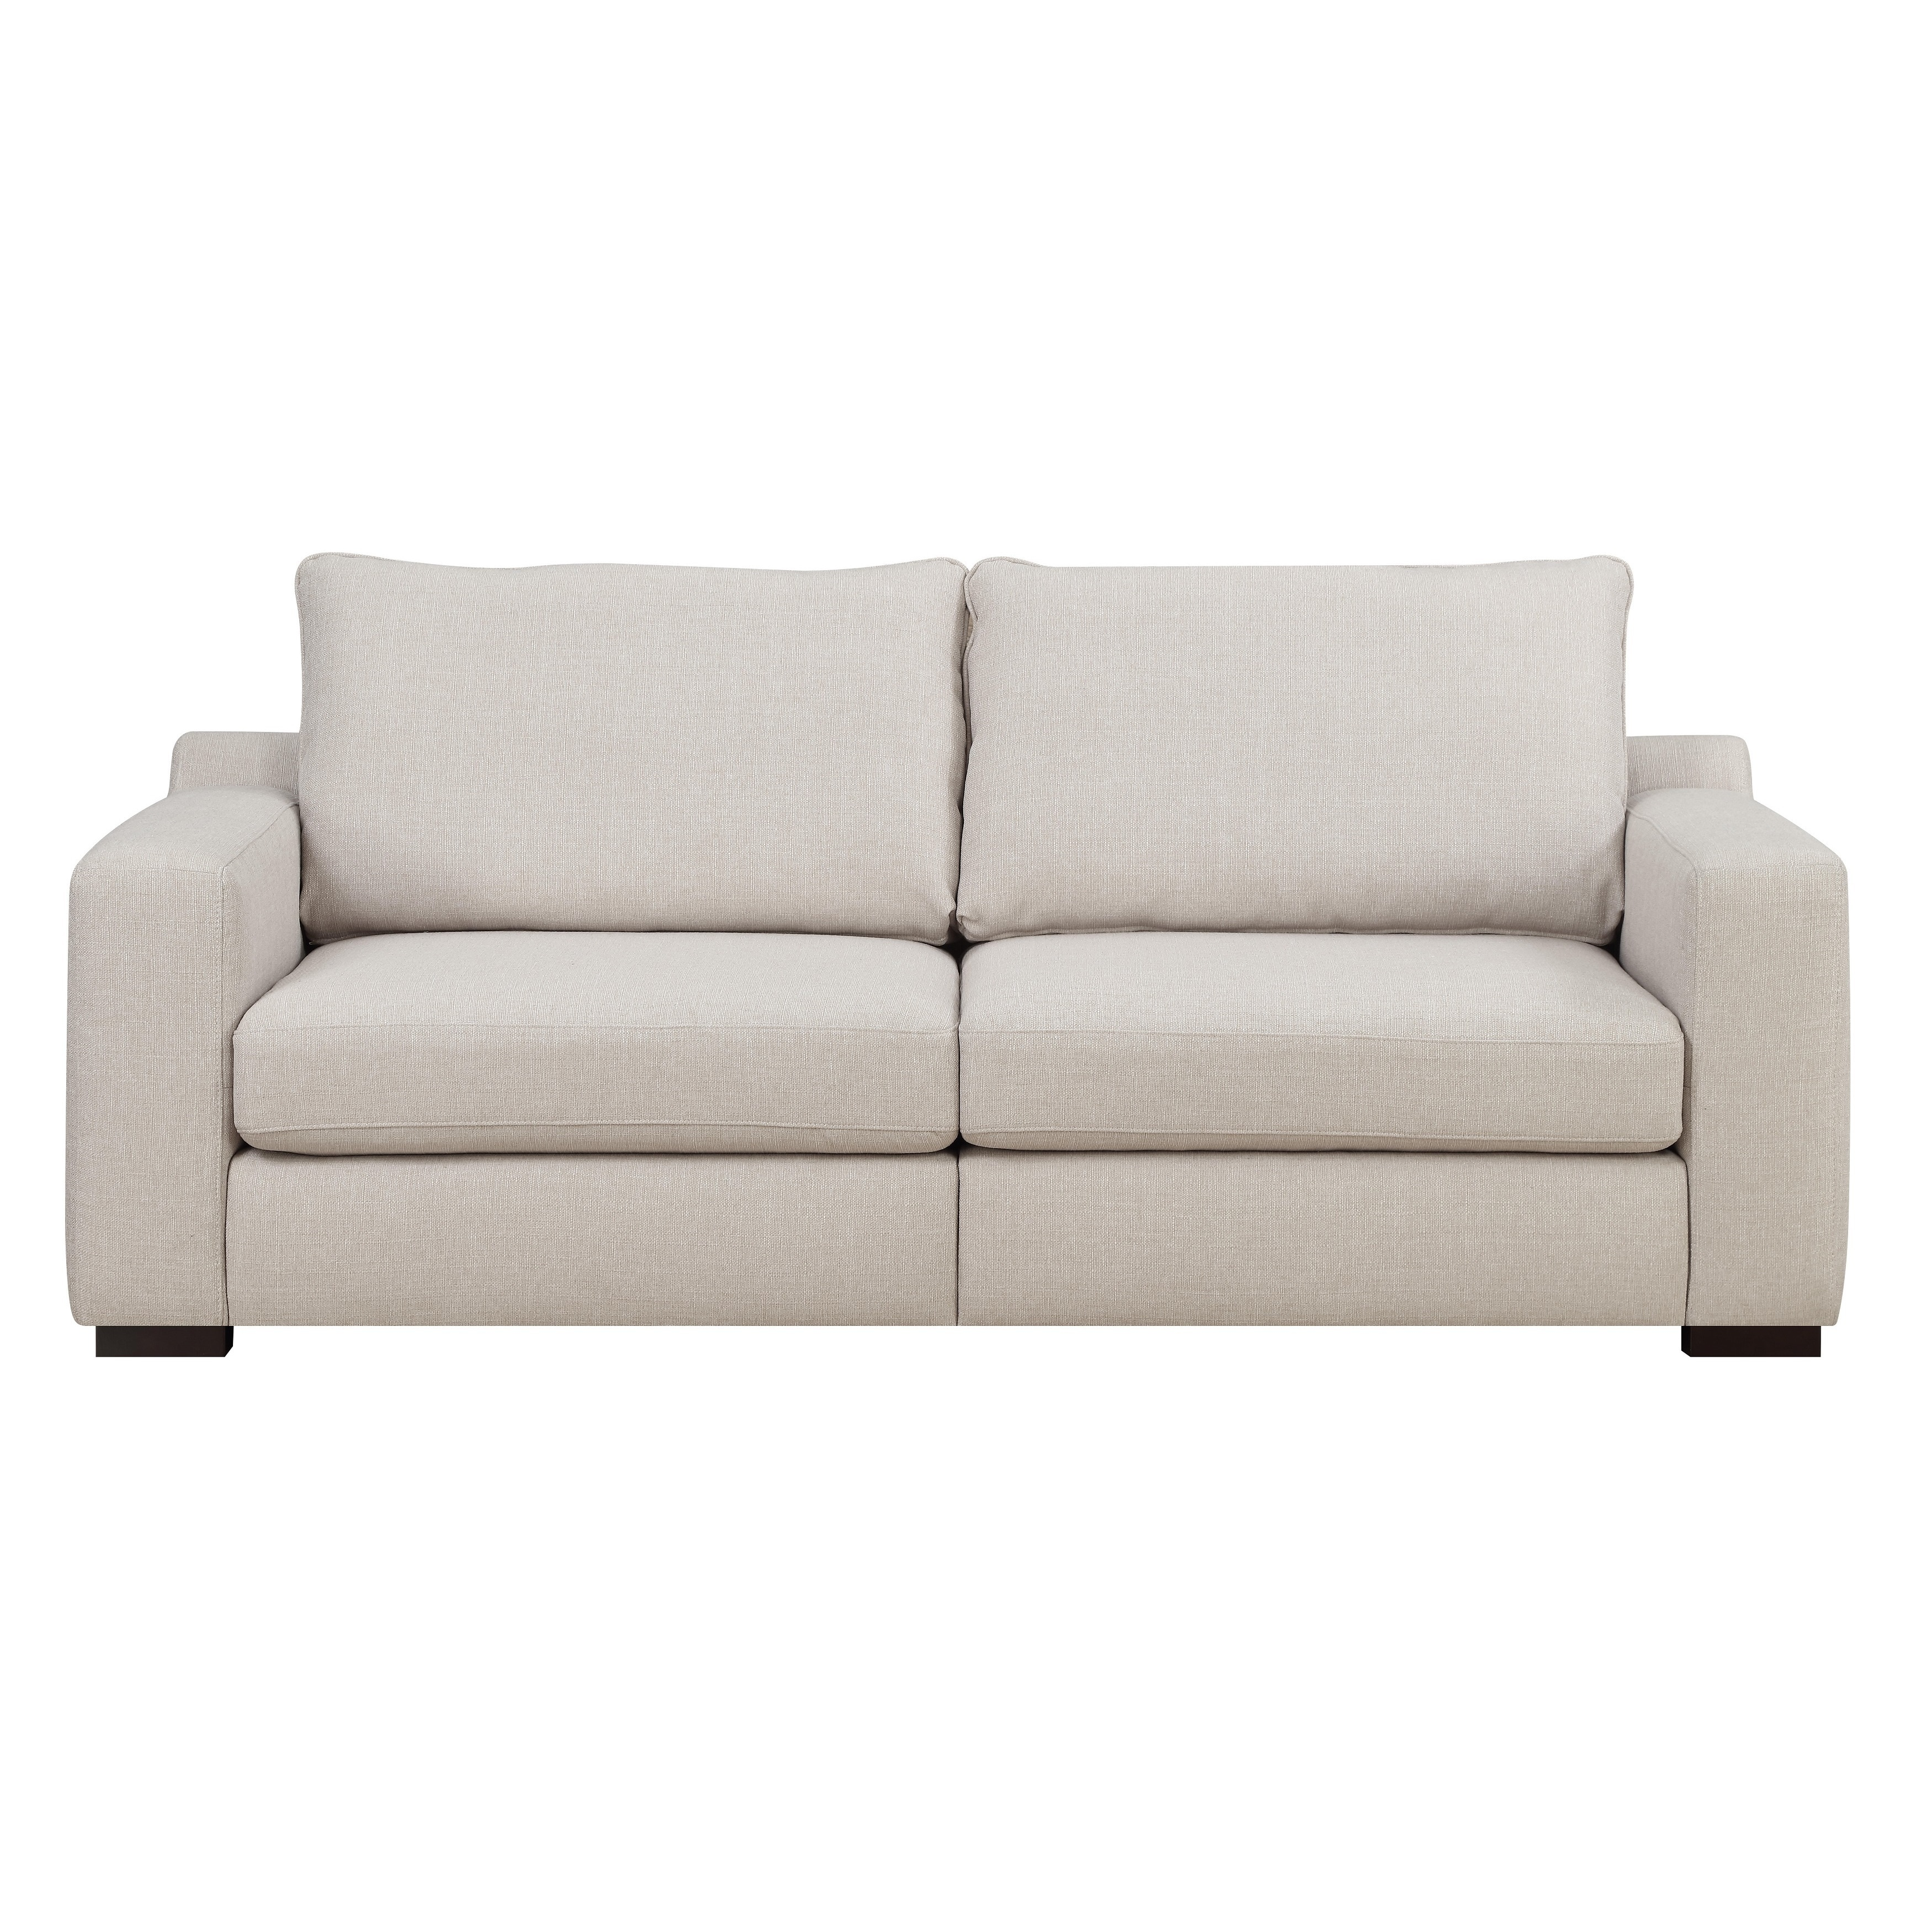 75 Inch Sofa Sofa Incredible 75 Inch 60 Clic Gray Cloth